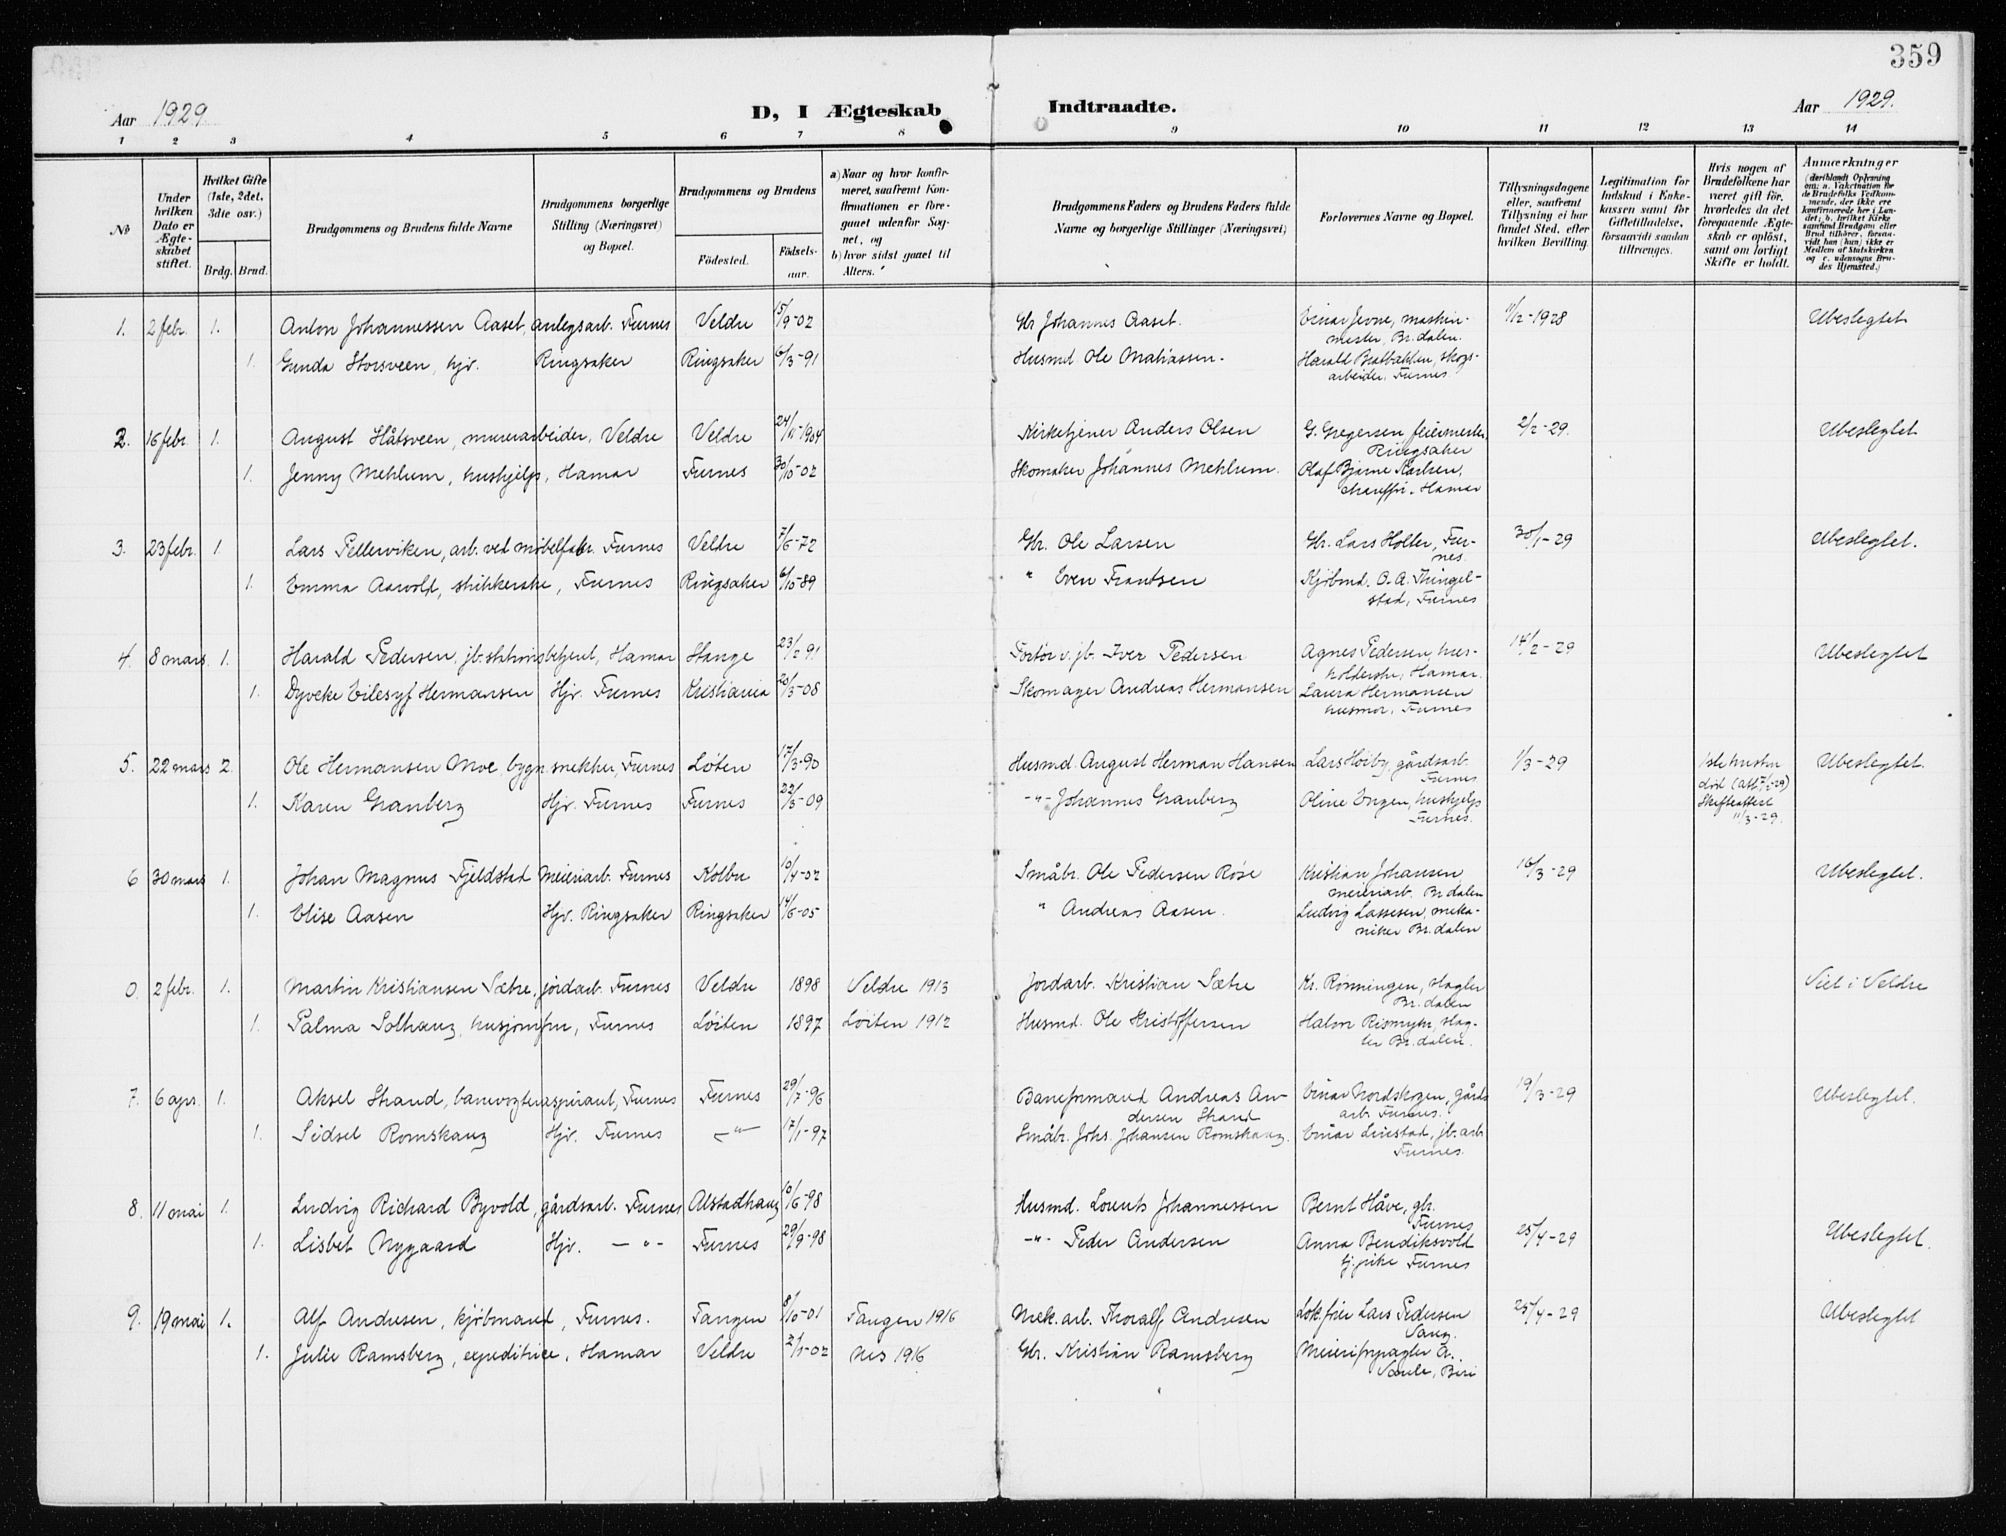 SAH, Furnes prestekontor, K/Ka/L0001: Ministerialbok nr. 1, 1907-1935, s. 359